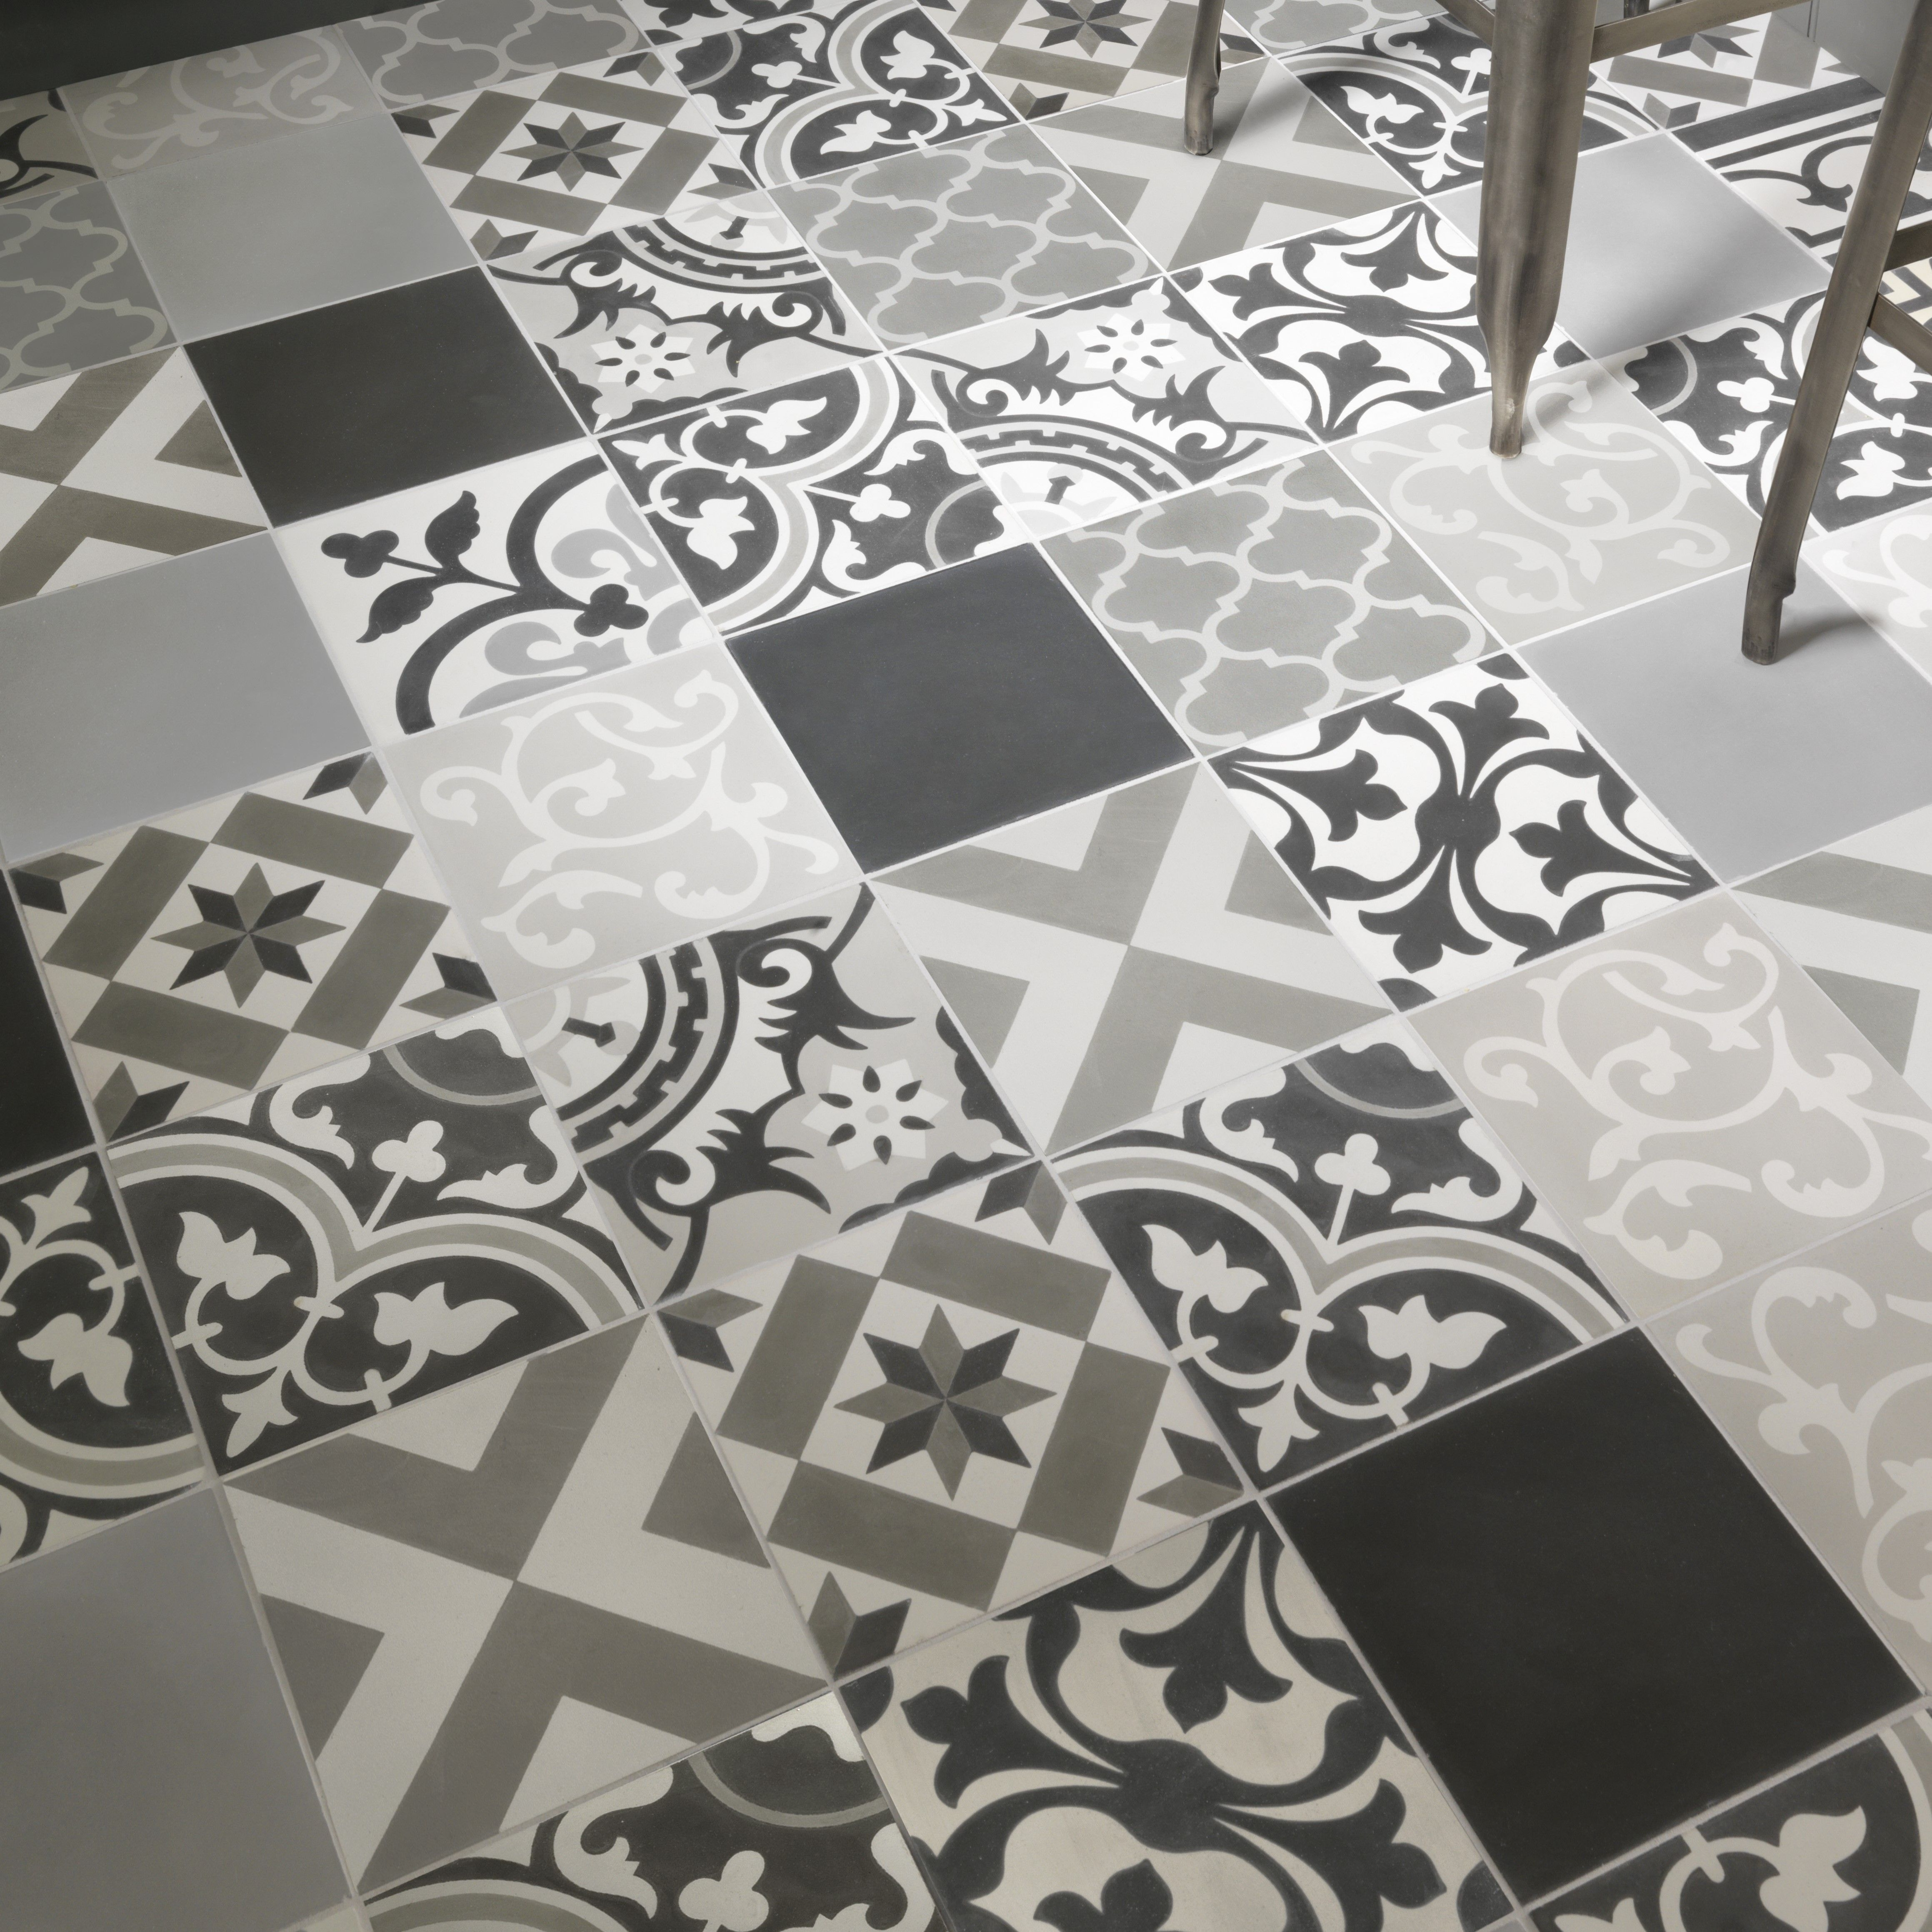 Ca Pietra Patchwork Grey Encaustic Edinburgh Tile Studio